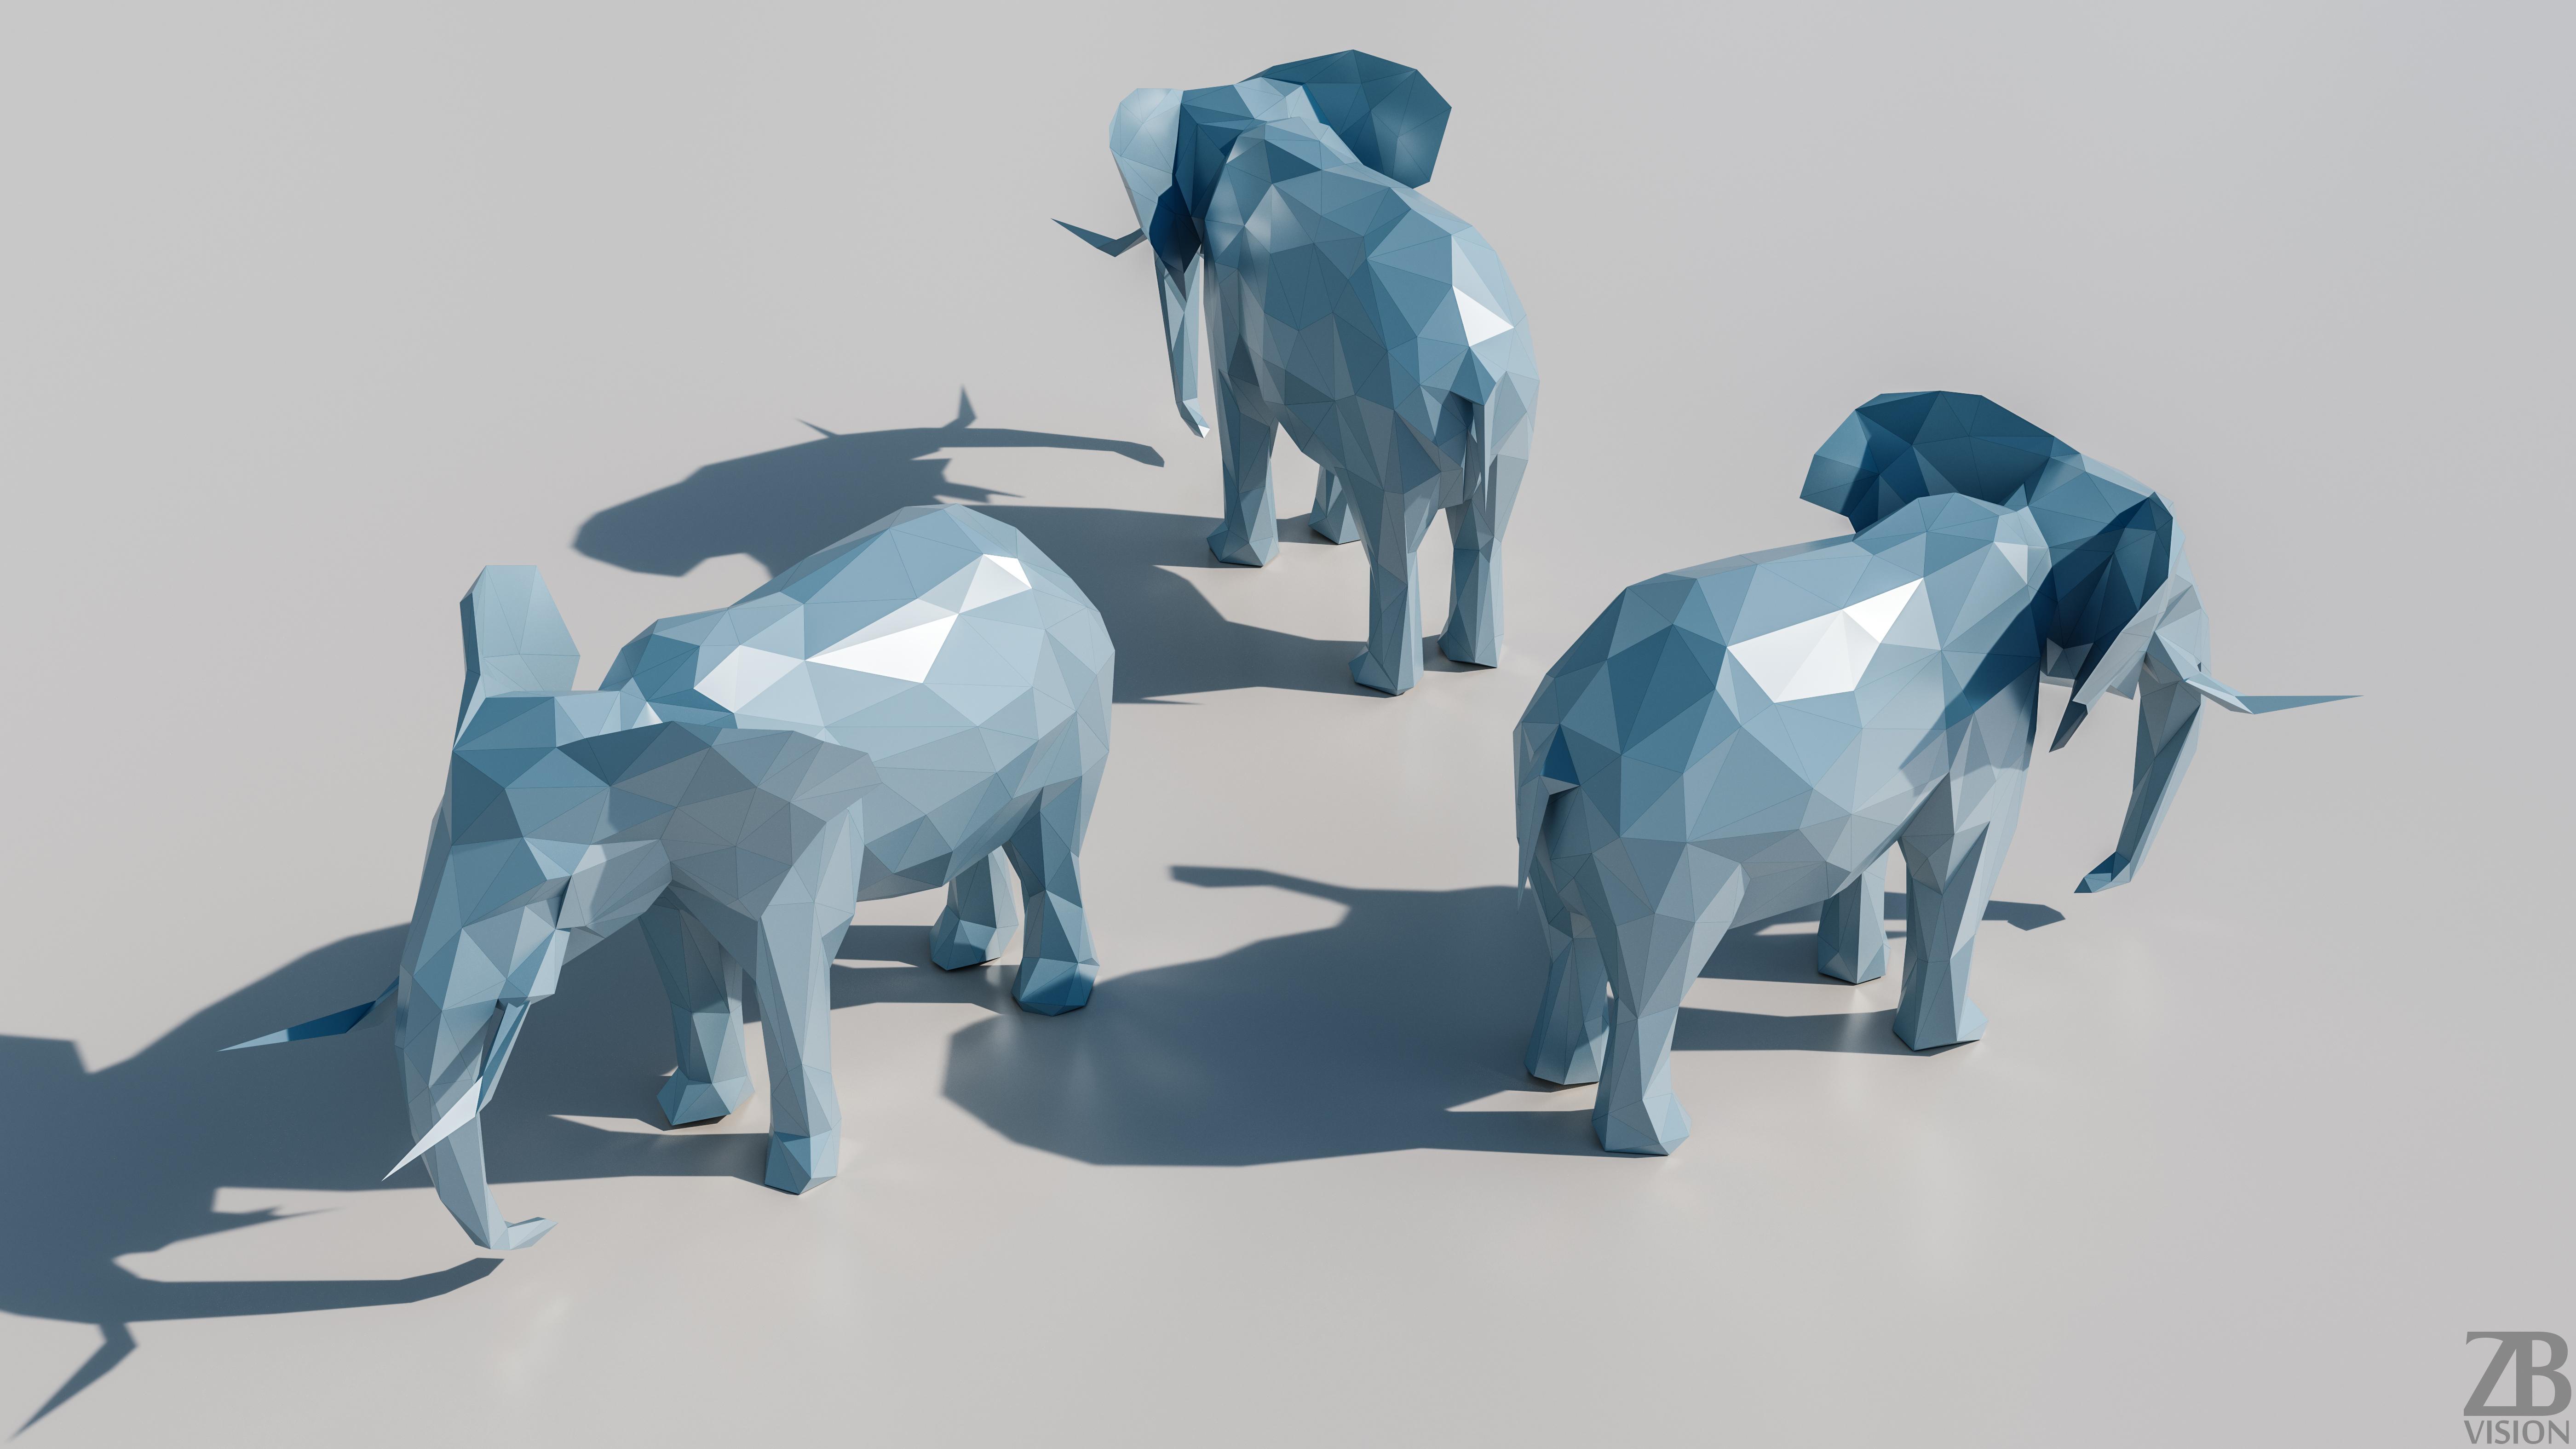 Lowpoly Elephant 001 By Luckyfox 3docean